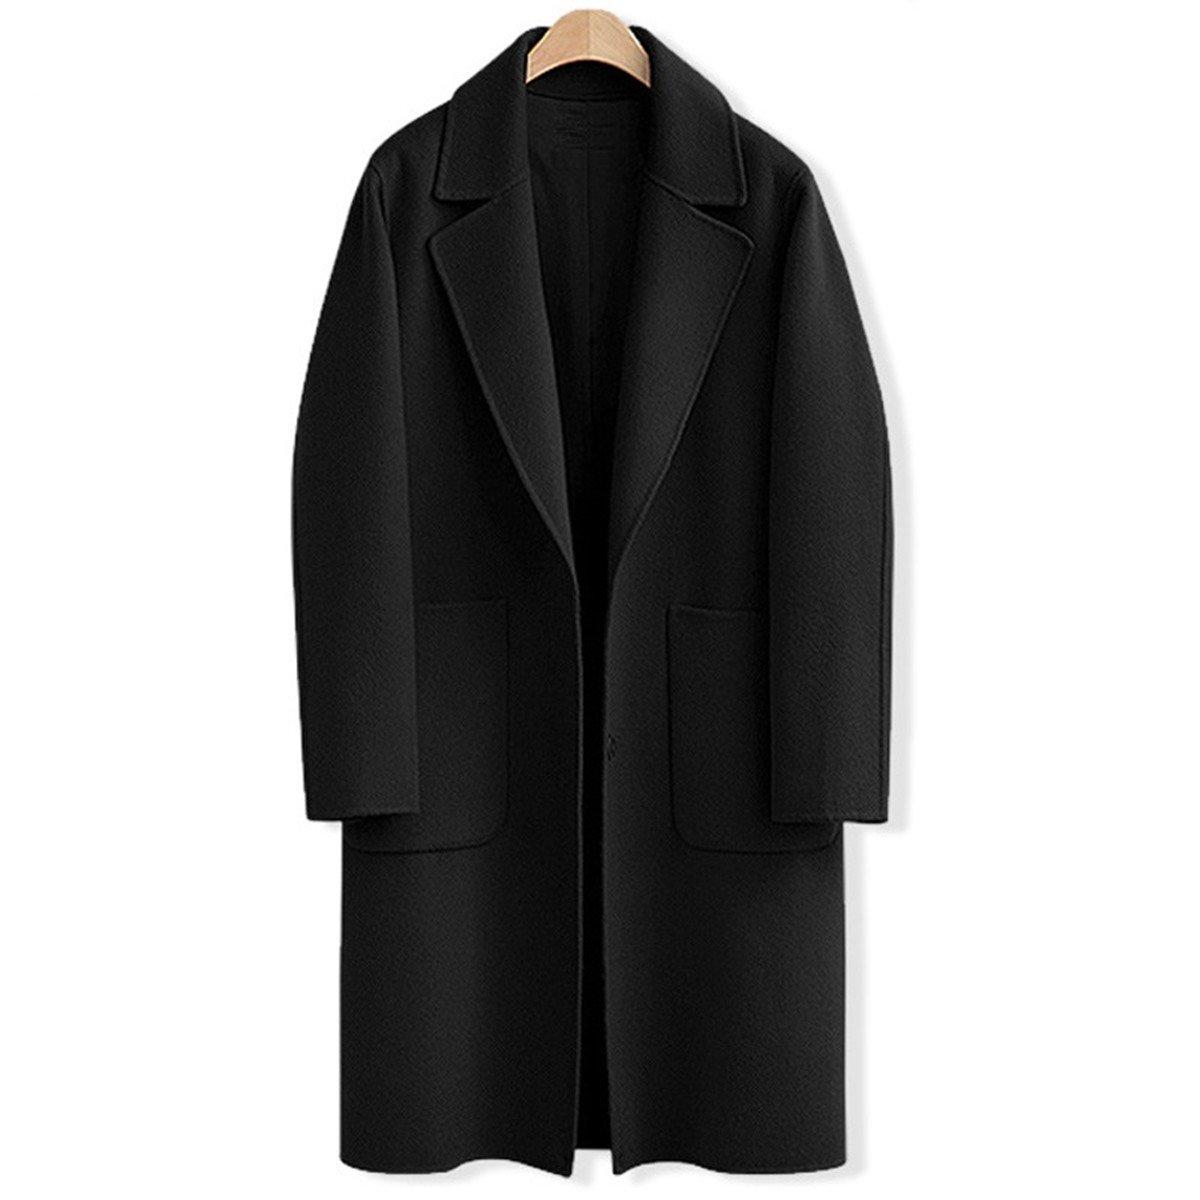 AOMEI Long Oversize Wool Coats for Women Winter Button Closure Black Color Outwear Size M